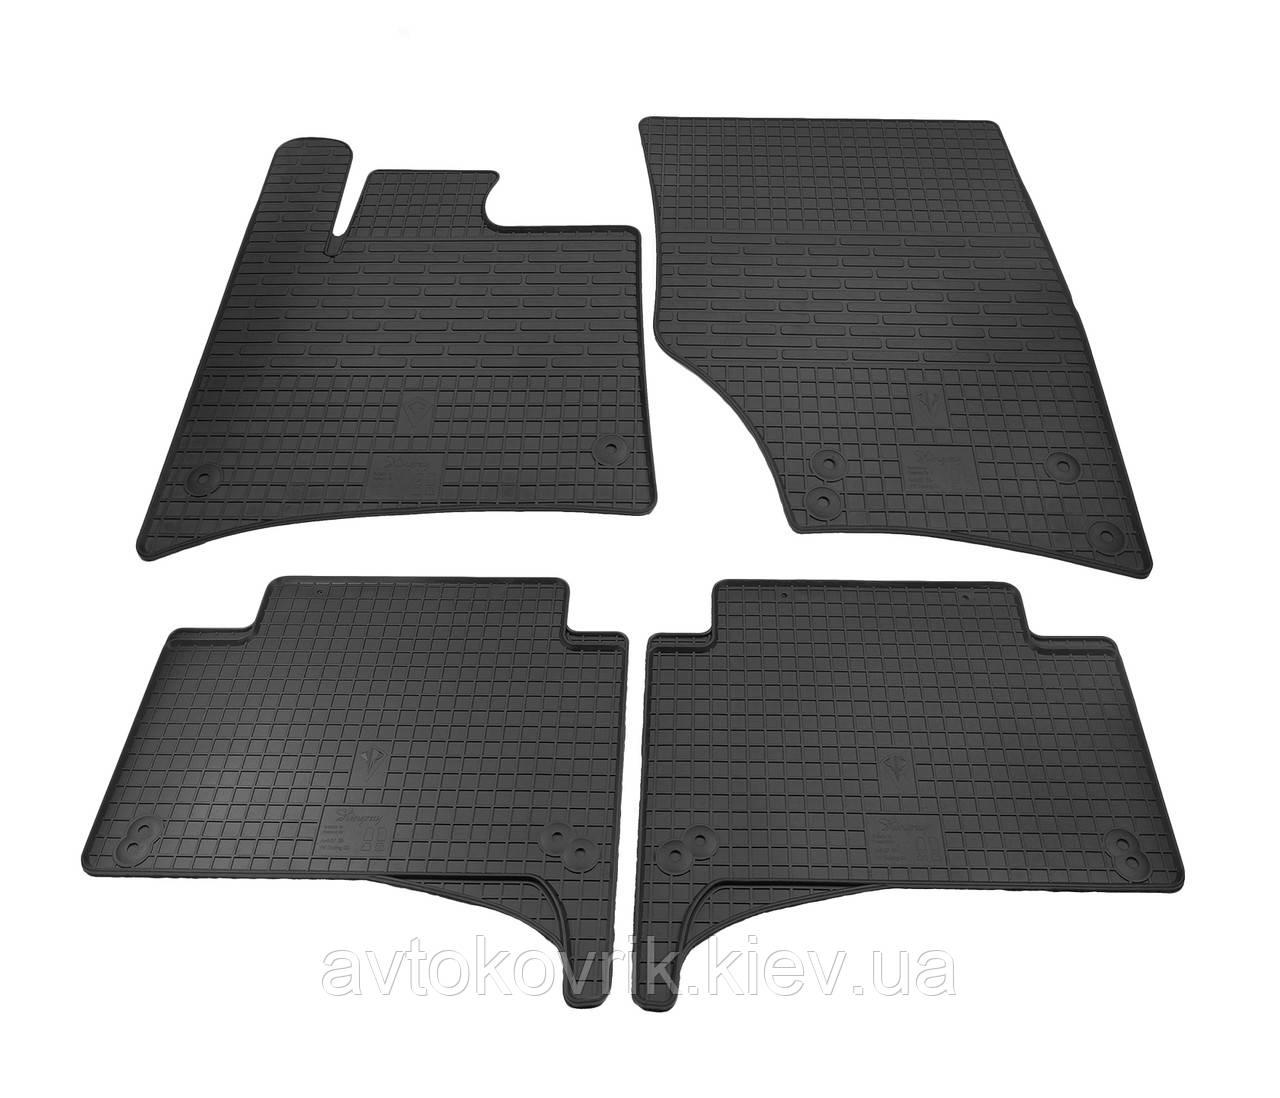 Резиновые коврики в салон Audi Q7 (4L) 2005-2015 (STINGRAY)